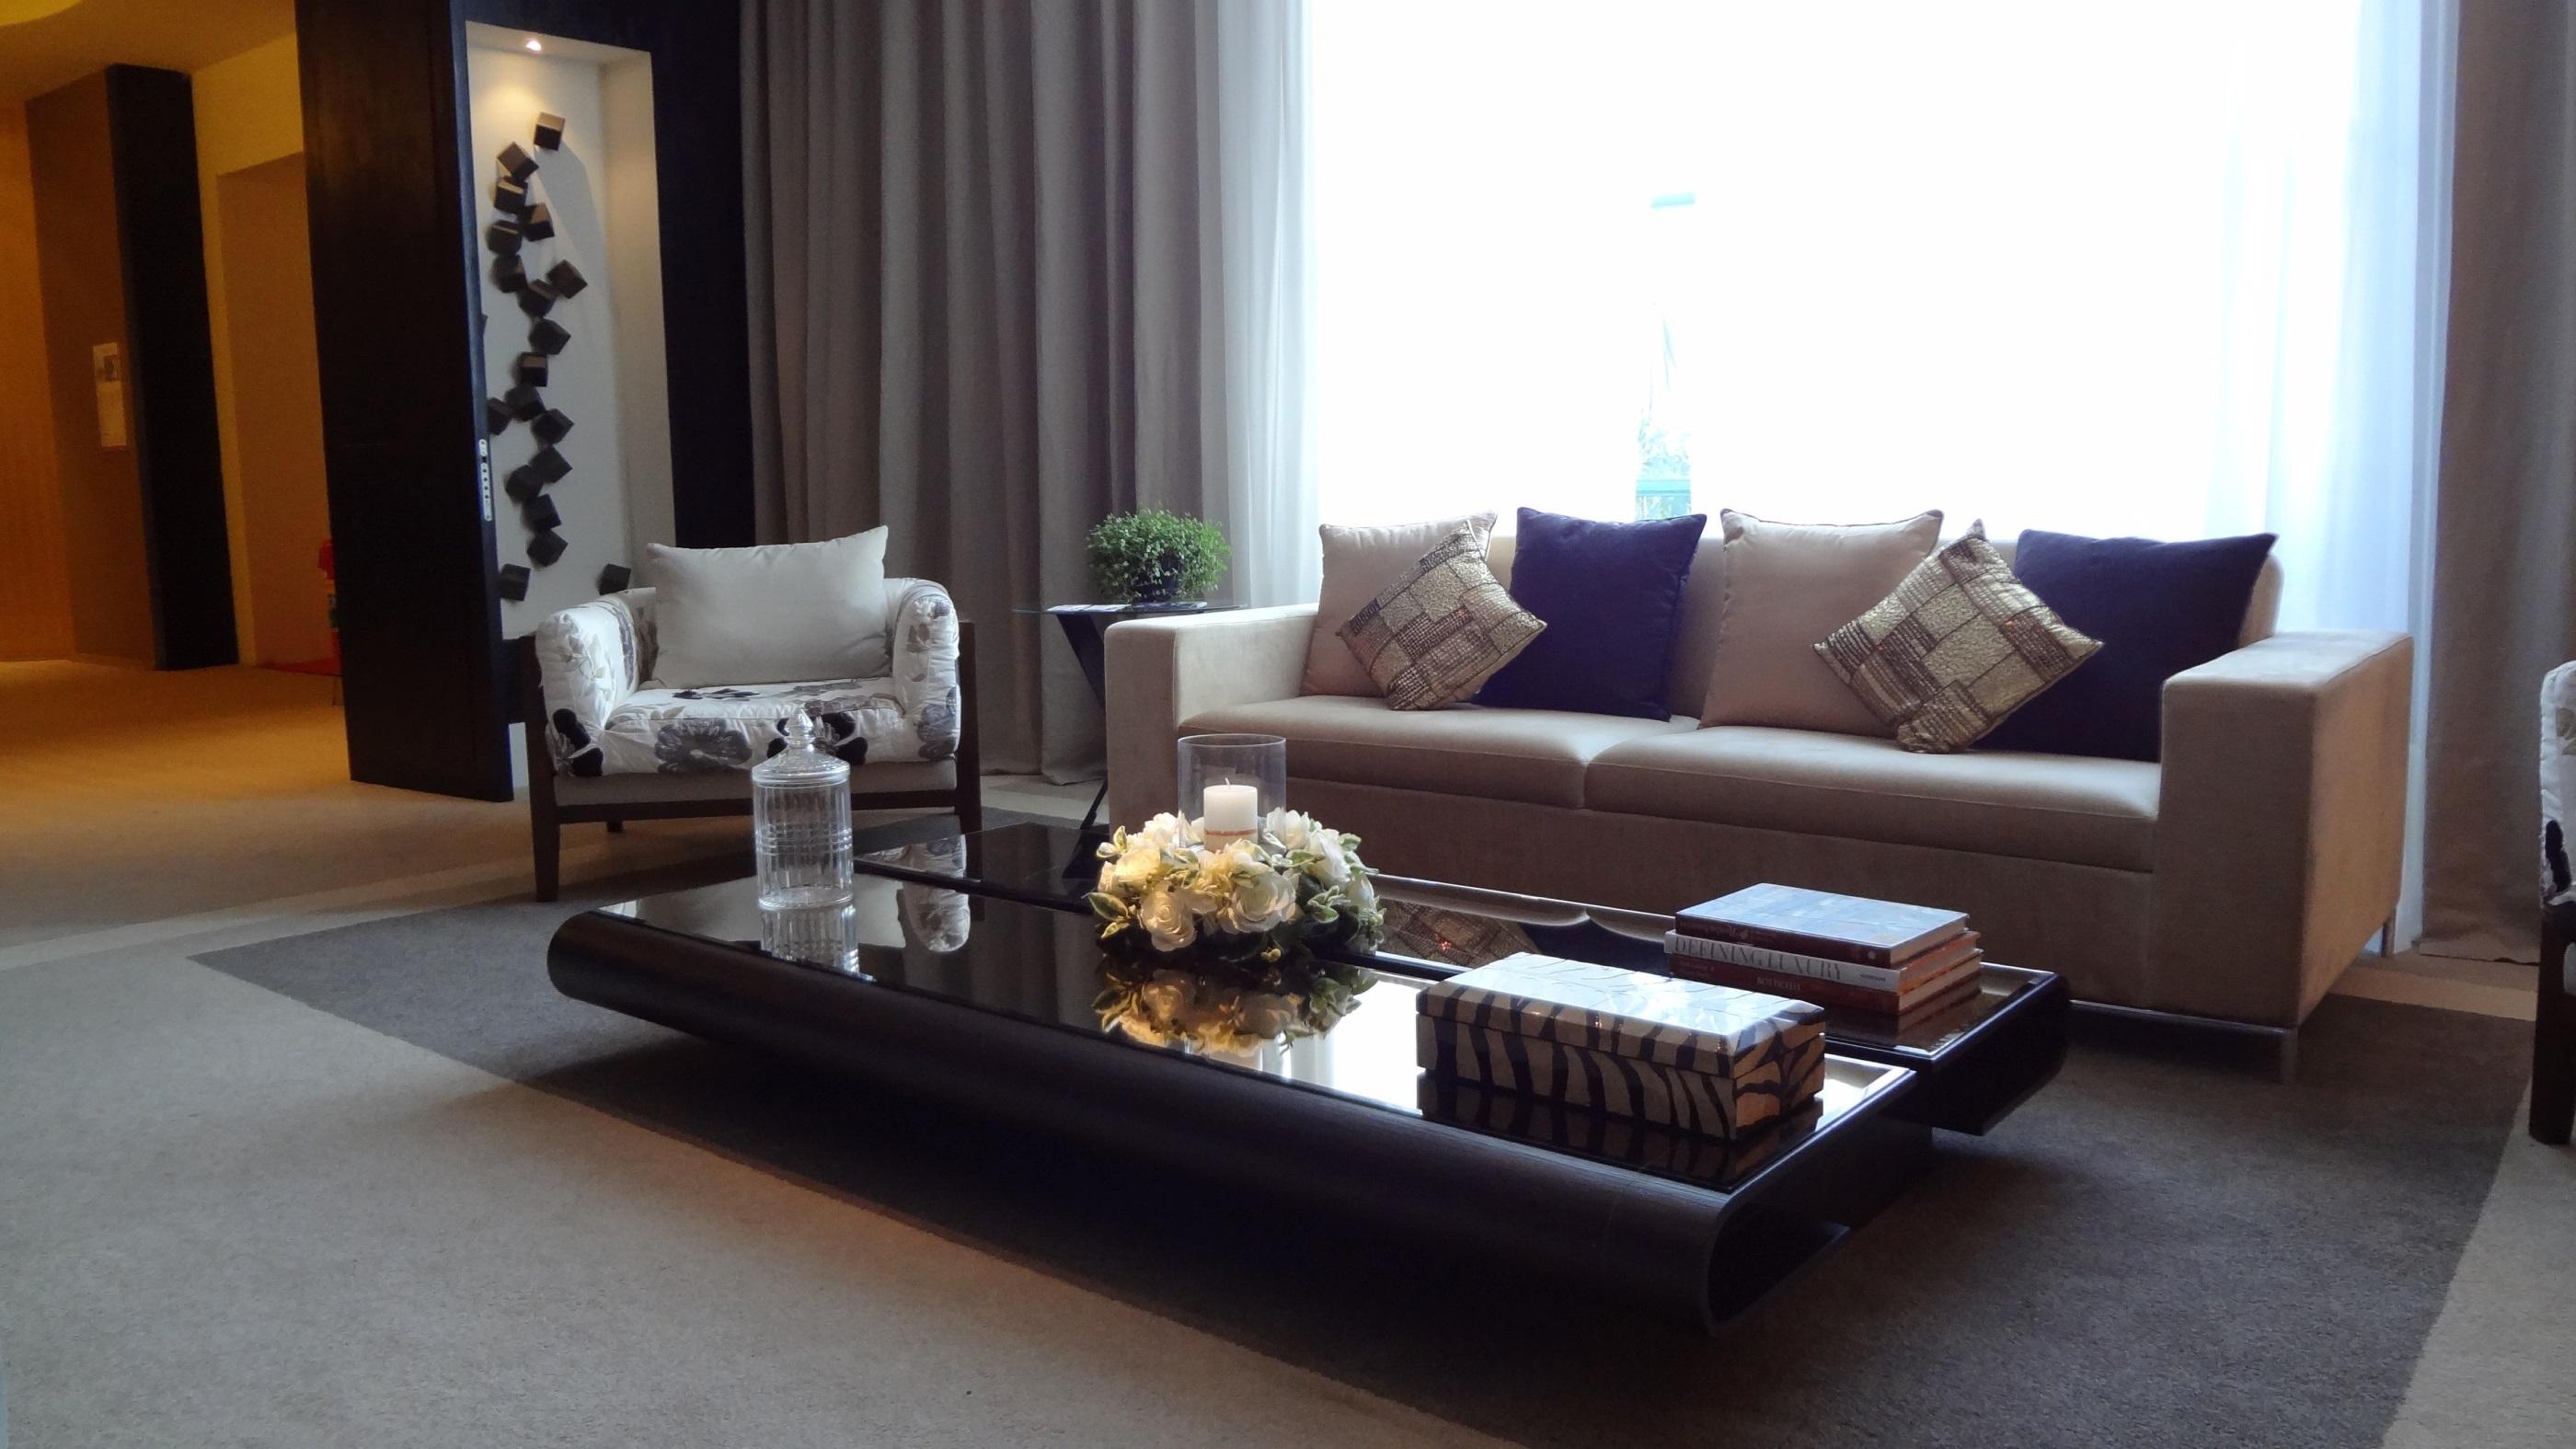 apartment-chair-comfort-276700